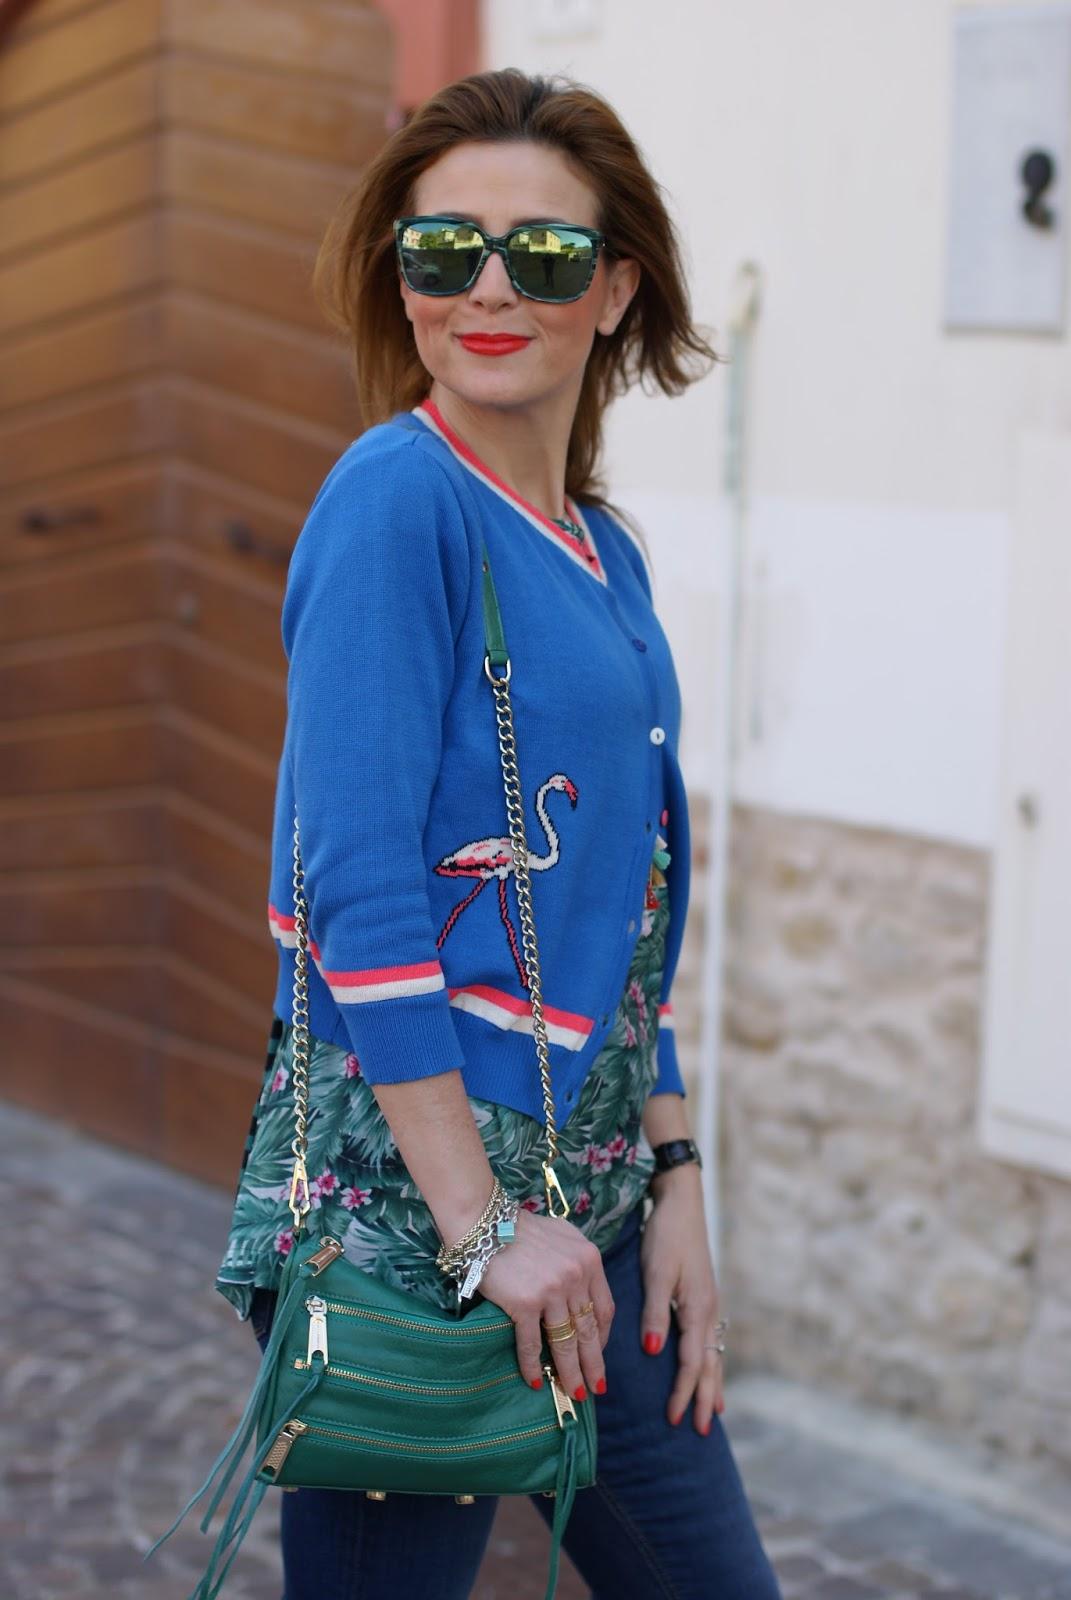 Bryony Flamingo cardigan on Fashion and Cookies fashion blog, fashion blogger style